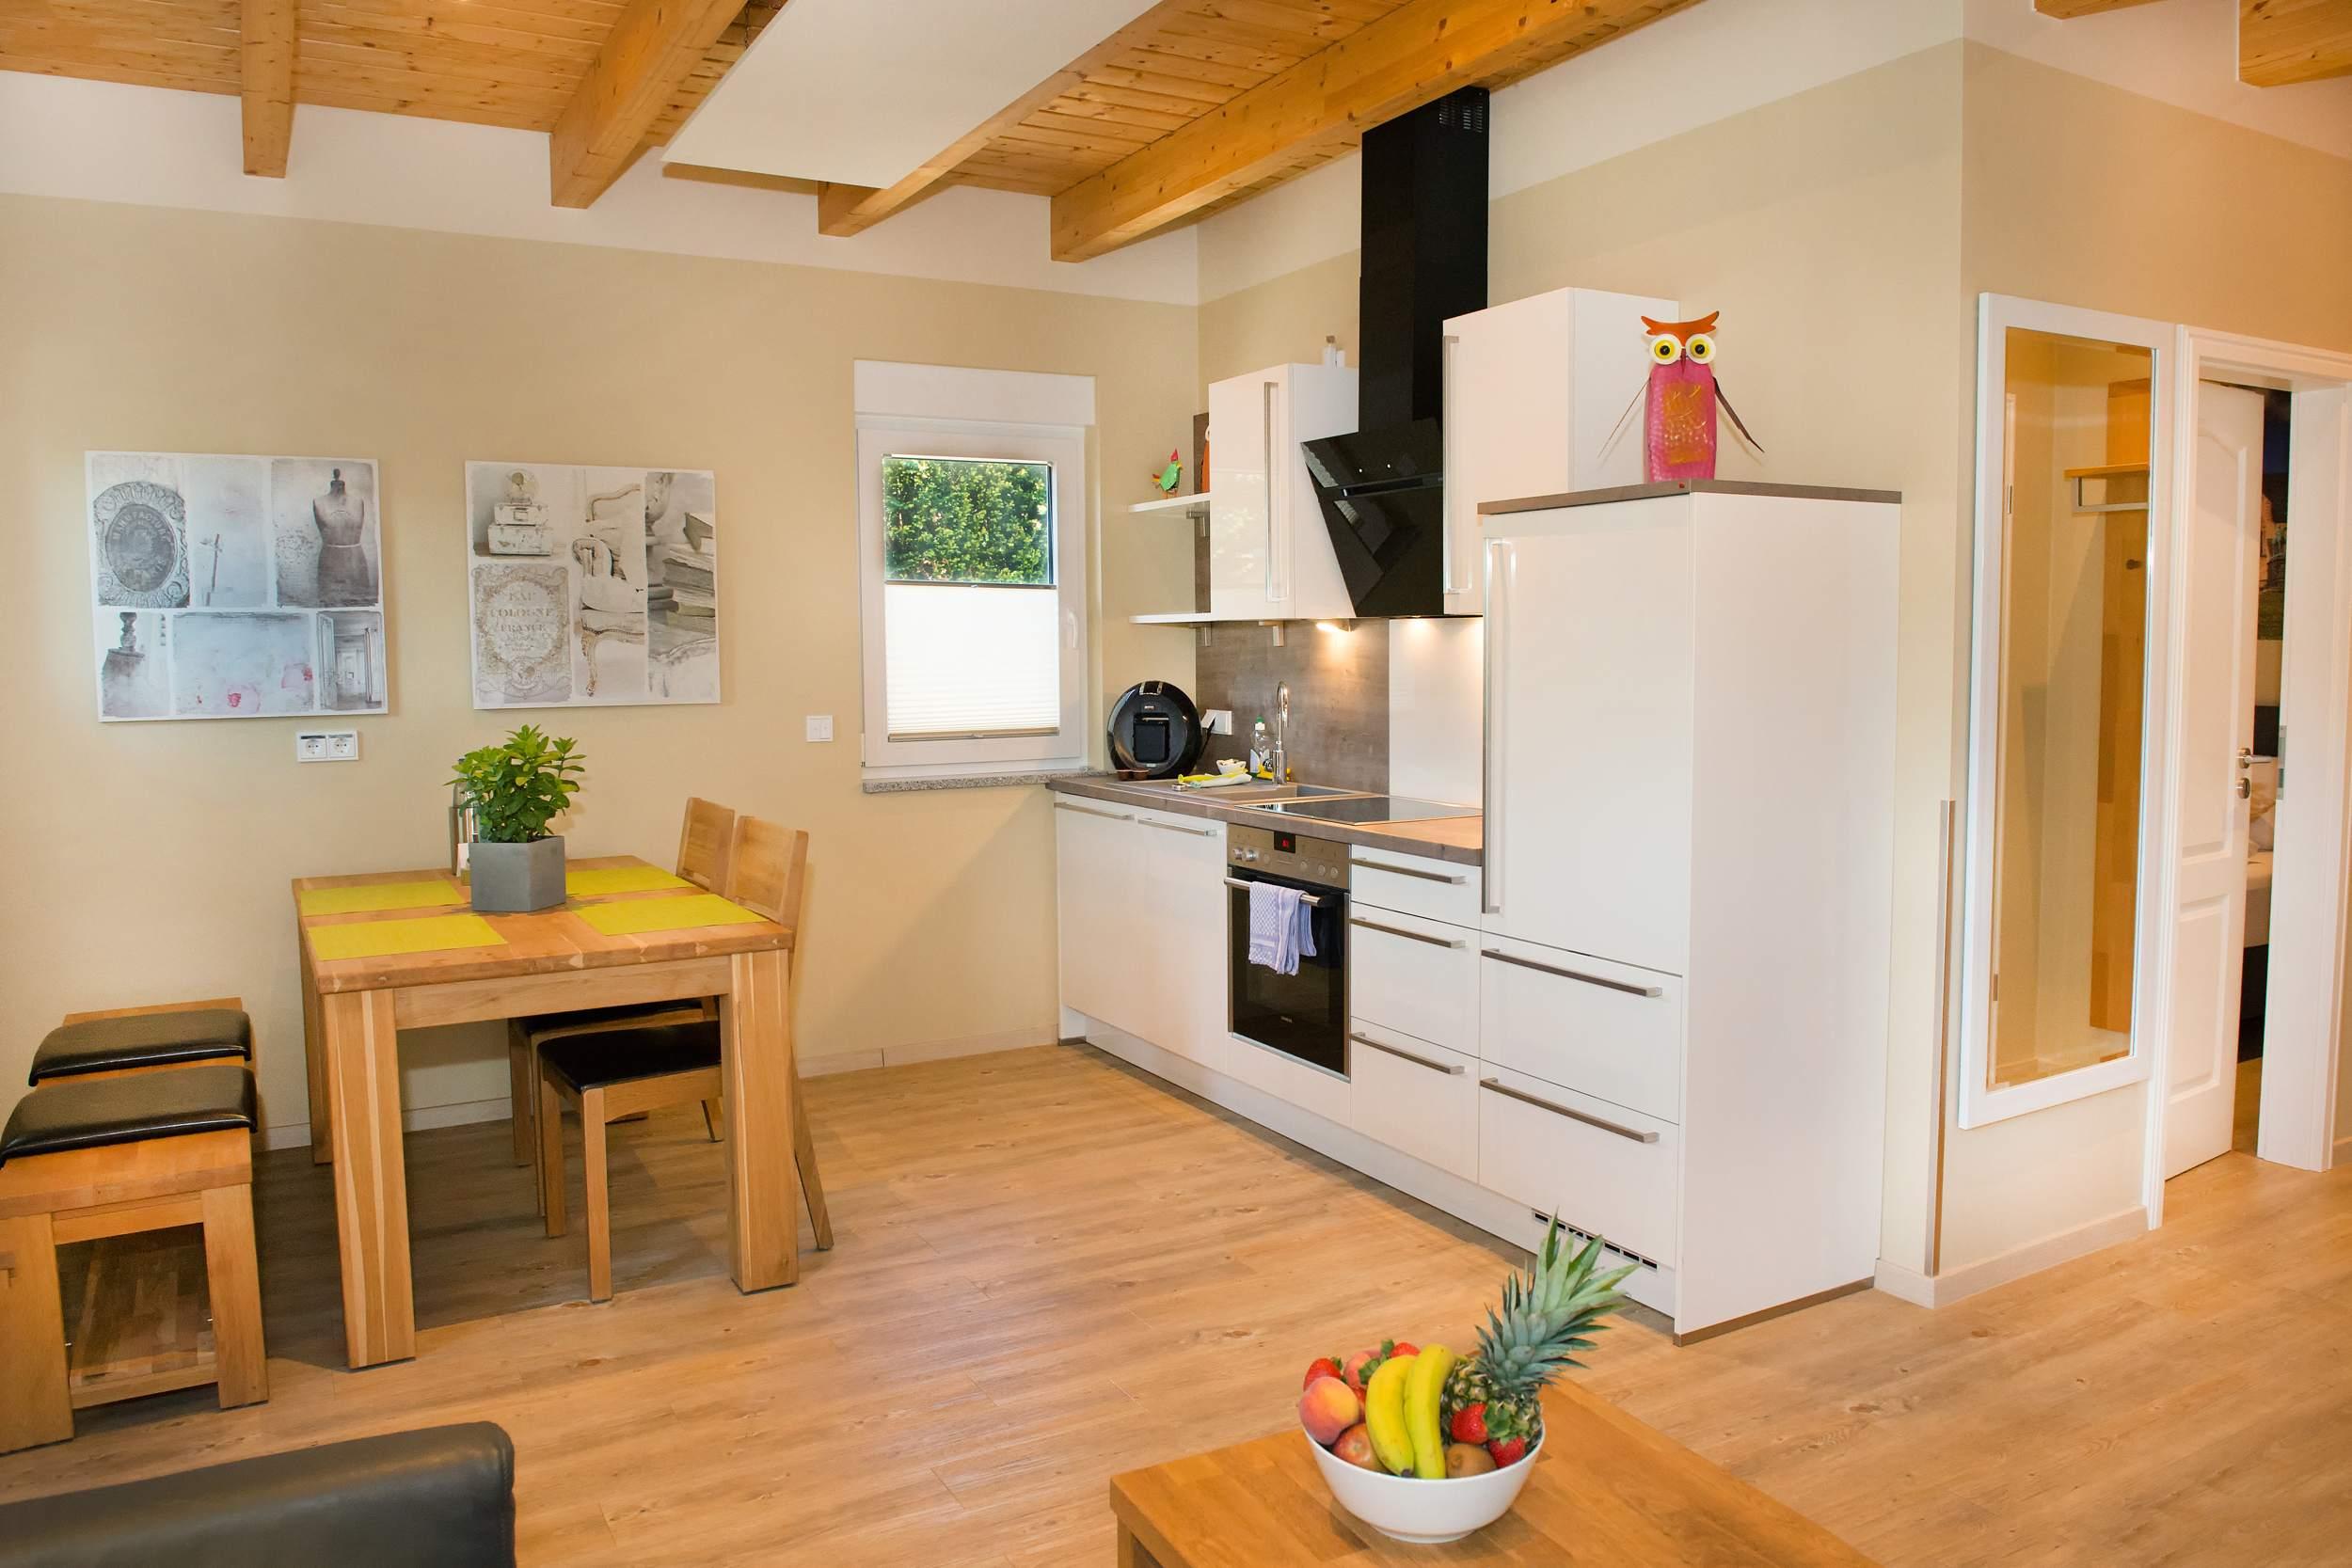 City Appartements am Wall Goslar - Küche